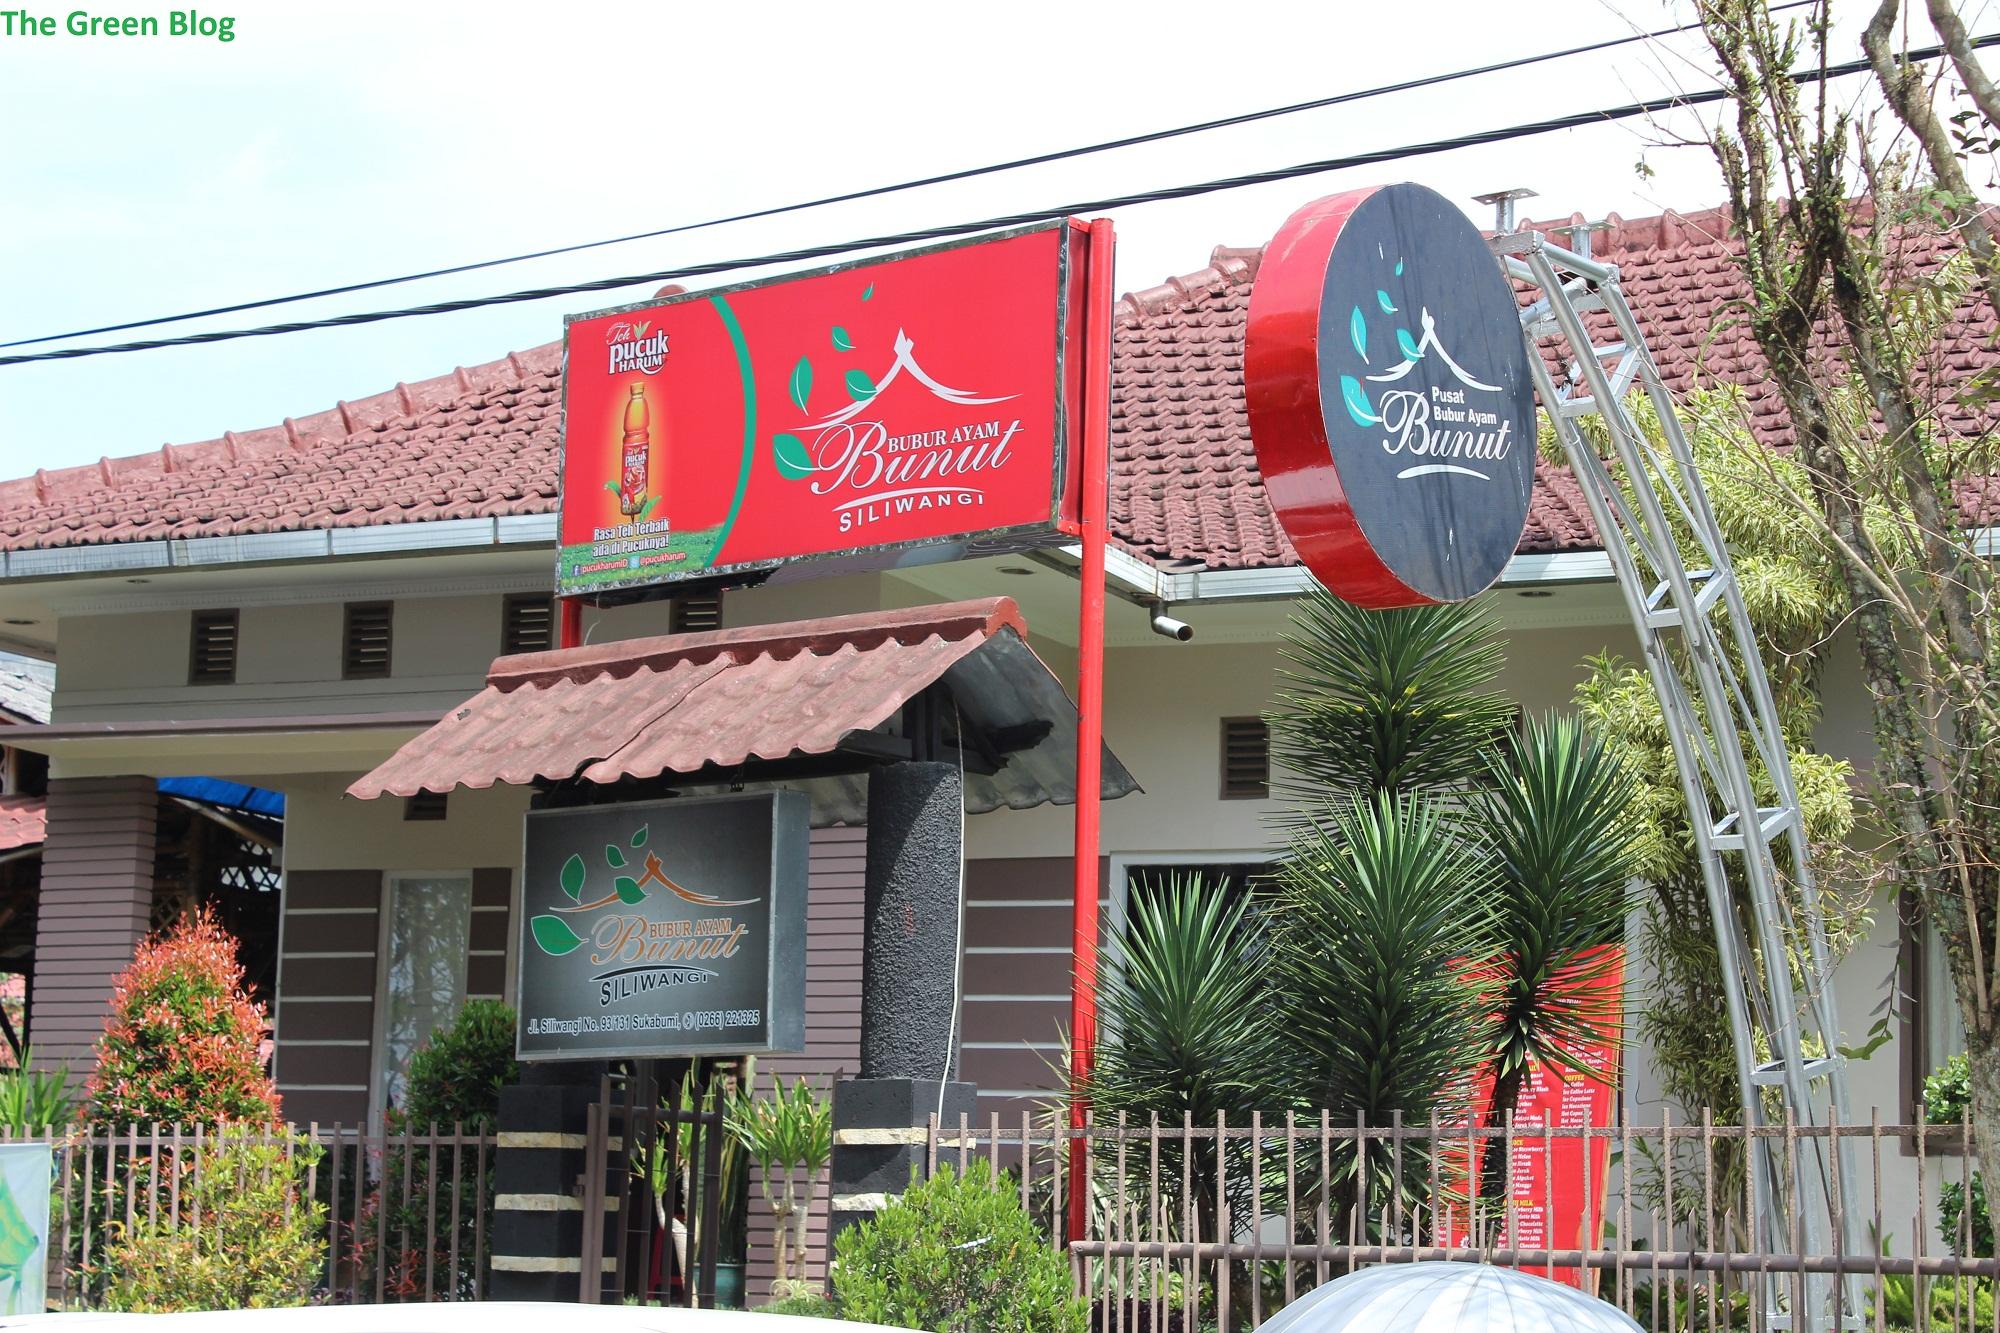 Wisata Kuliner Legendaris Kota Sukabumi The Green Blog